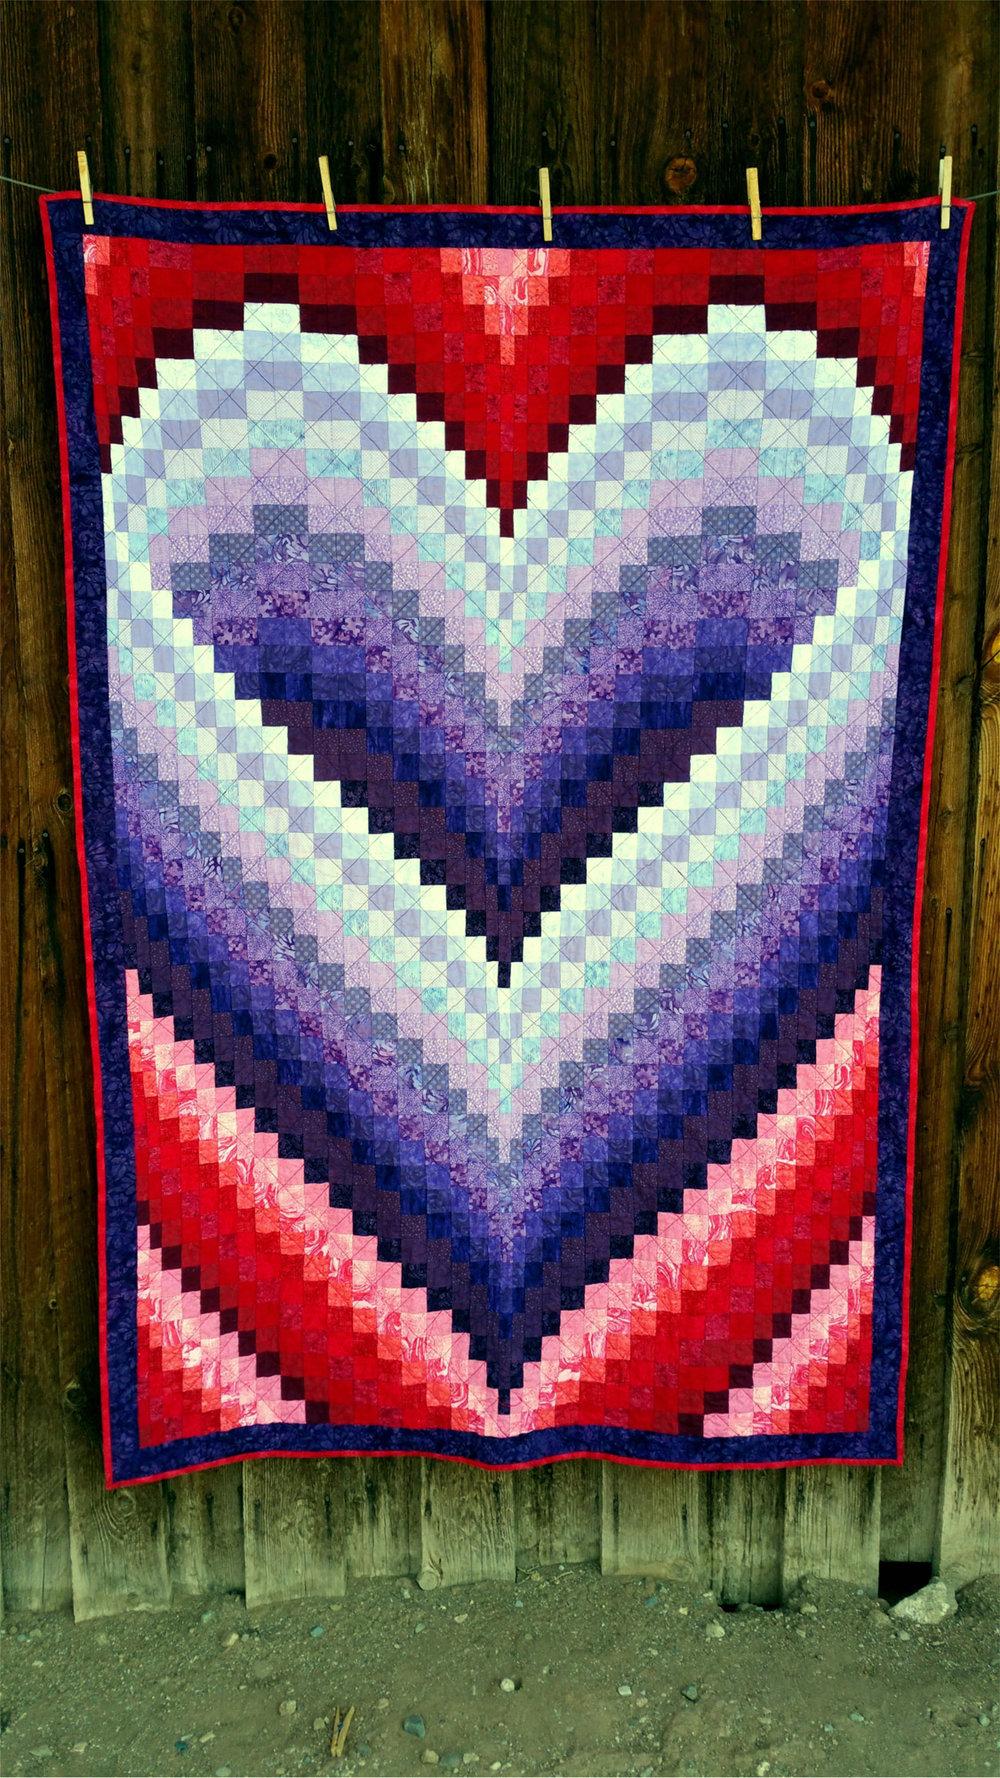 HUGHES cathie - heart quilt.jpg